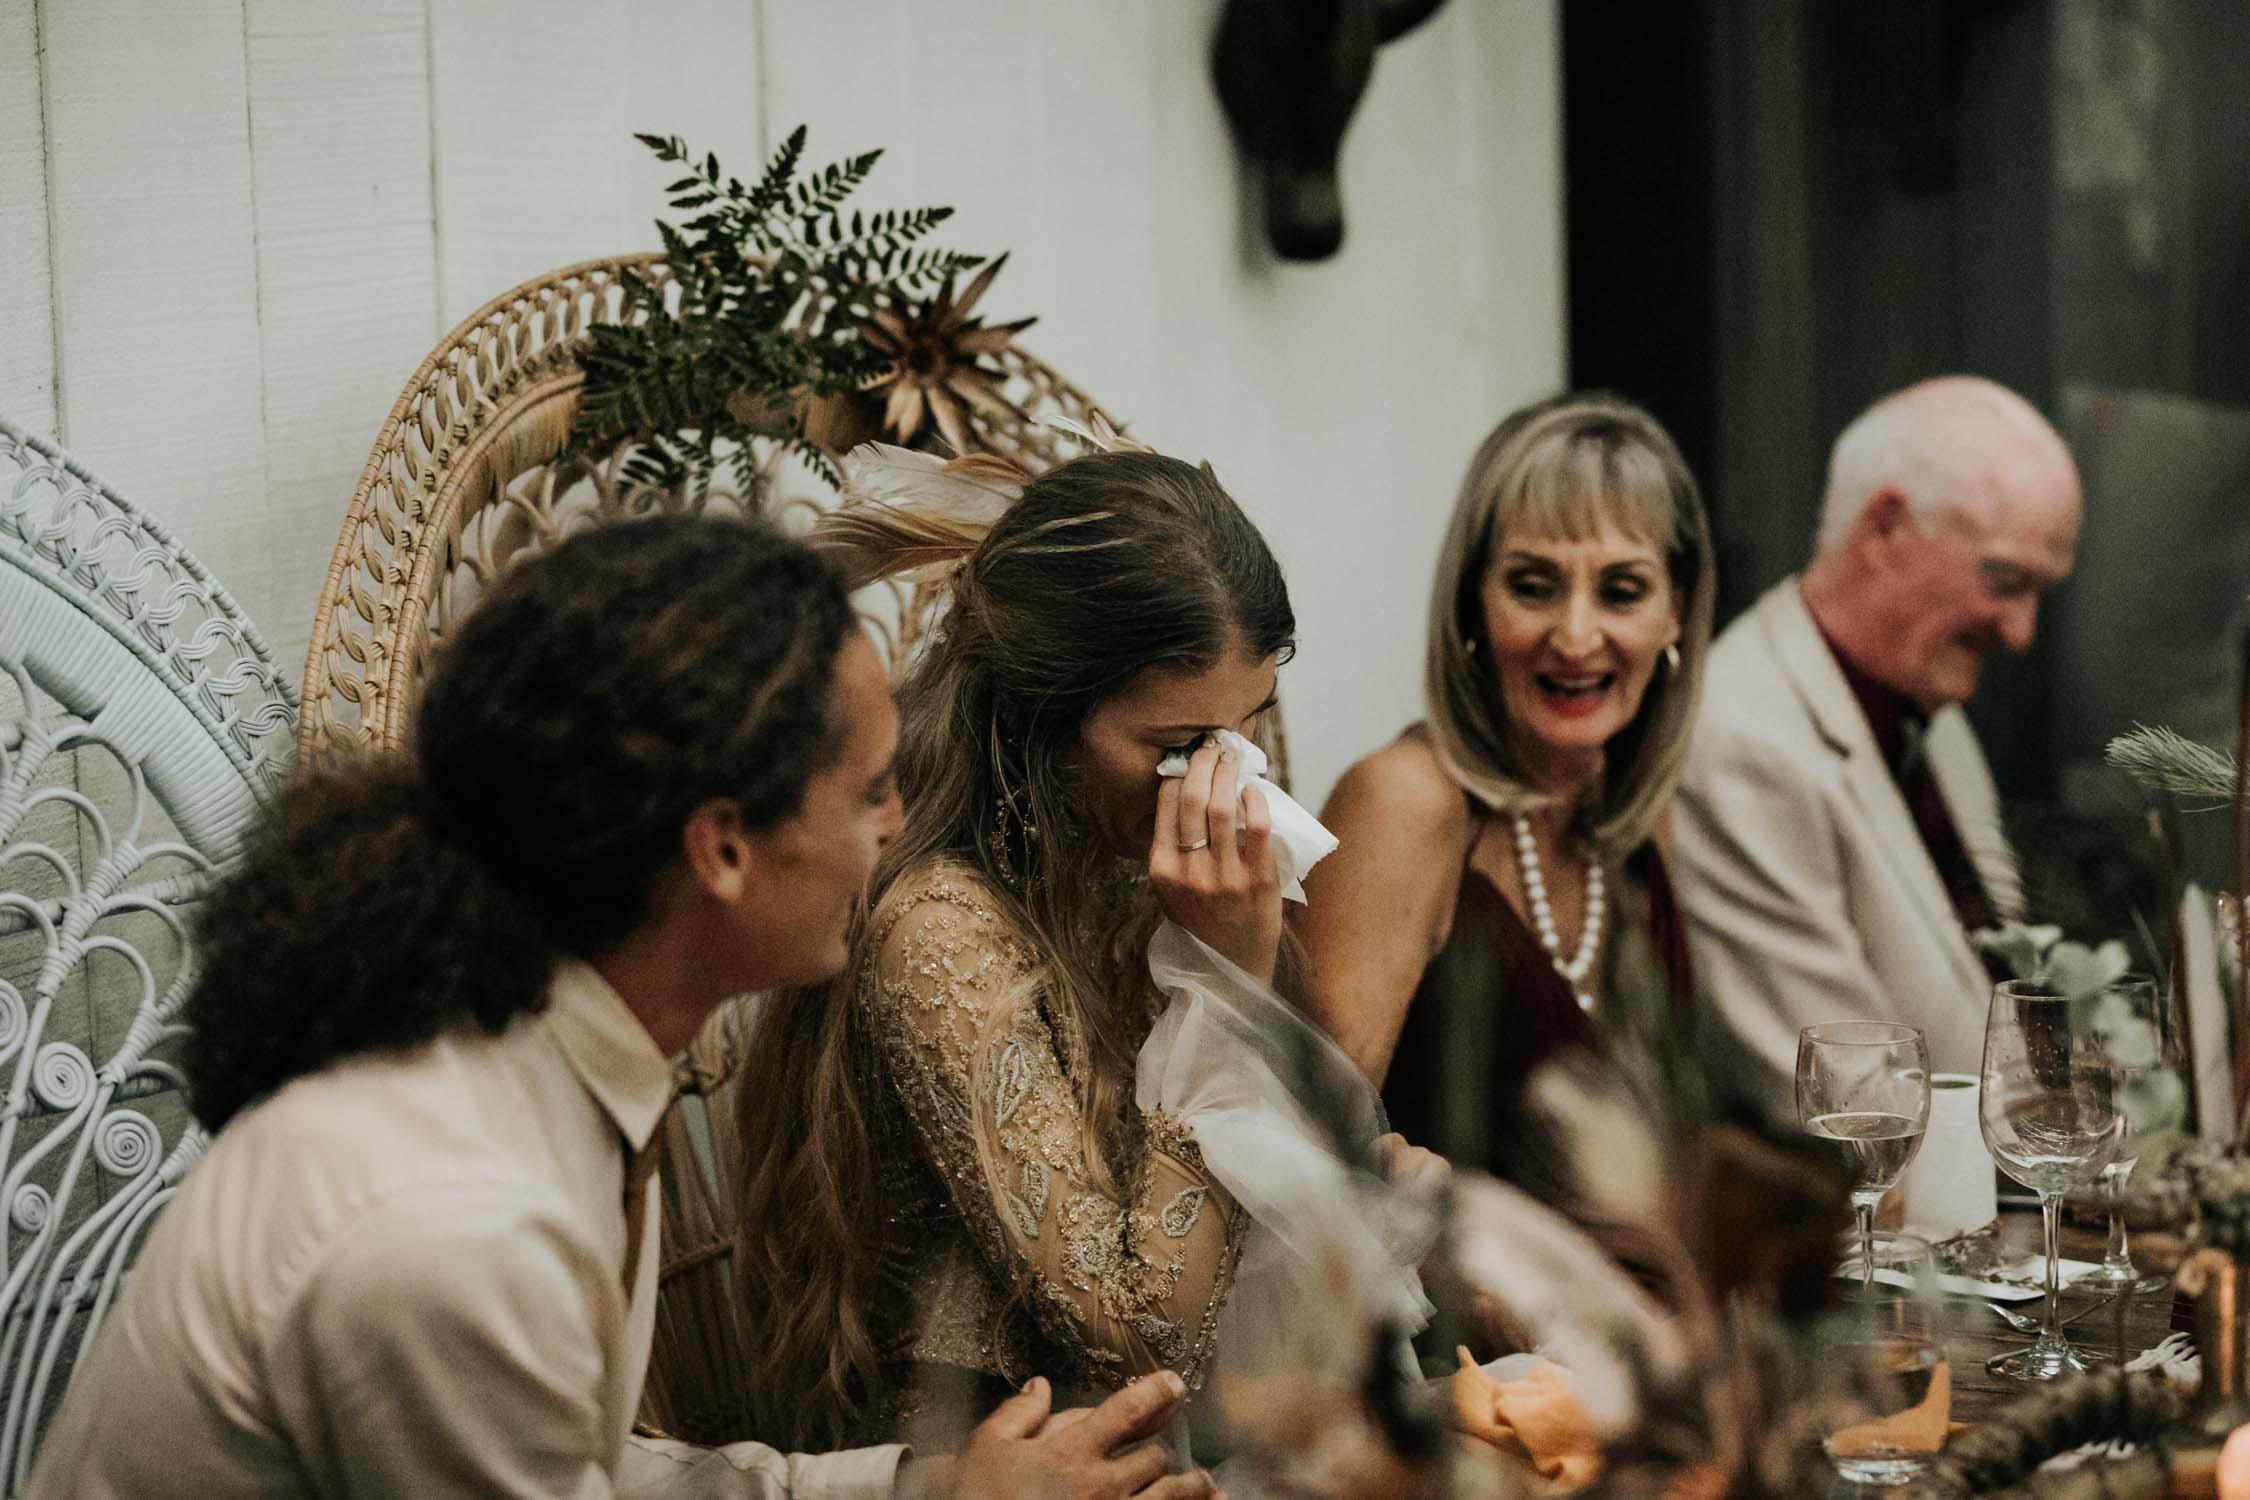 Bride cries sitting in Bali Boho Wicker Peacock Chairs during wedding speech